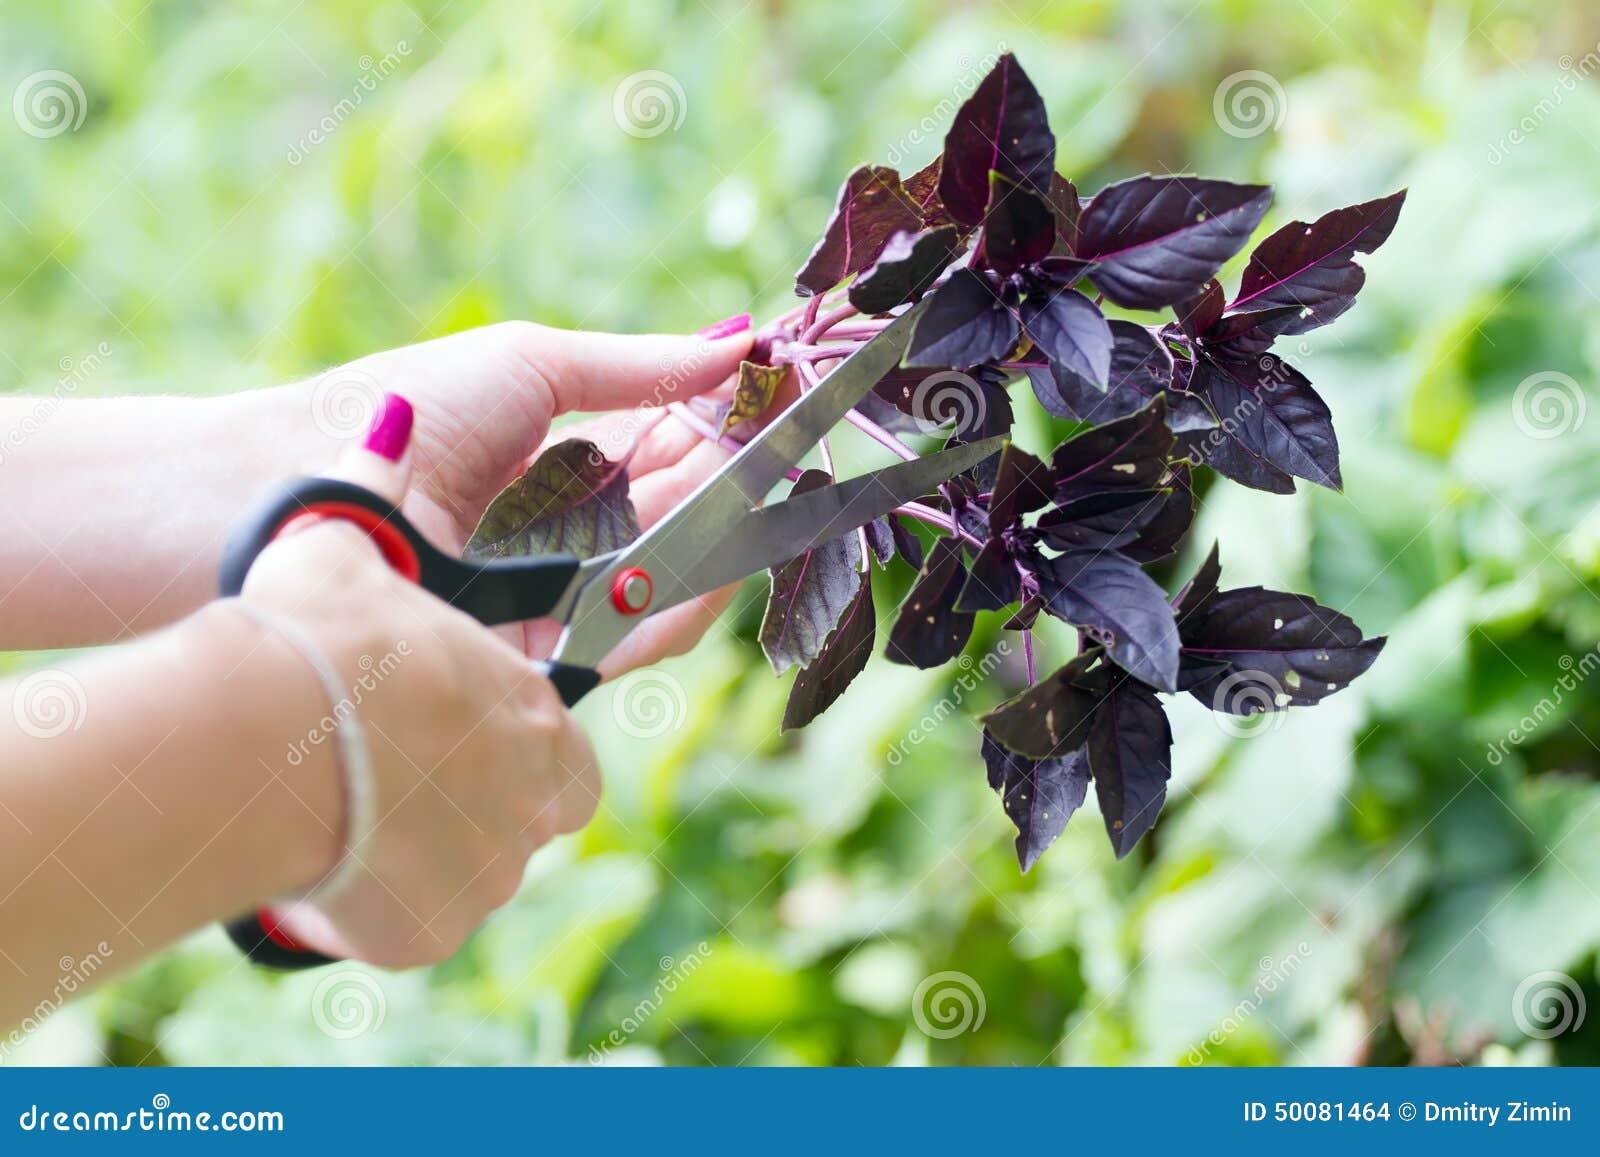 Ręka z basilem